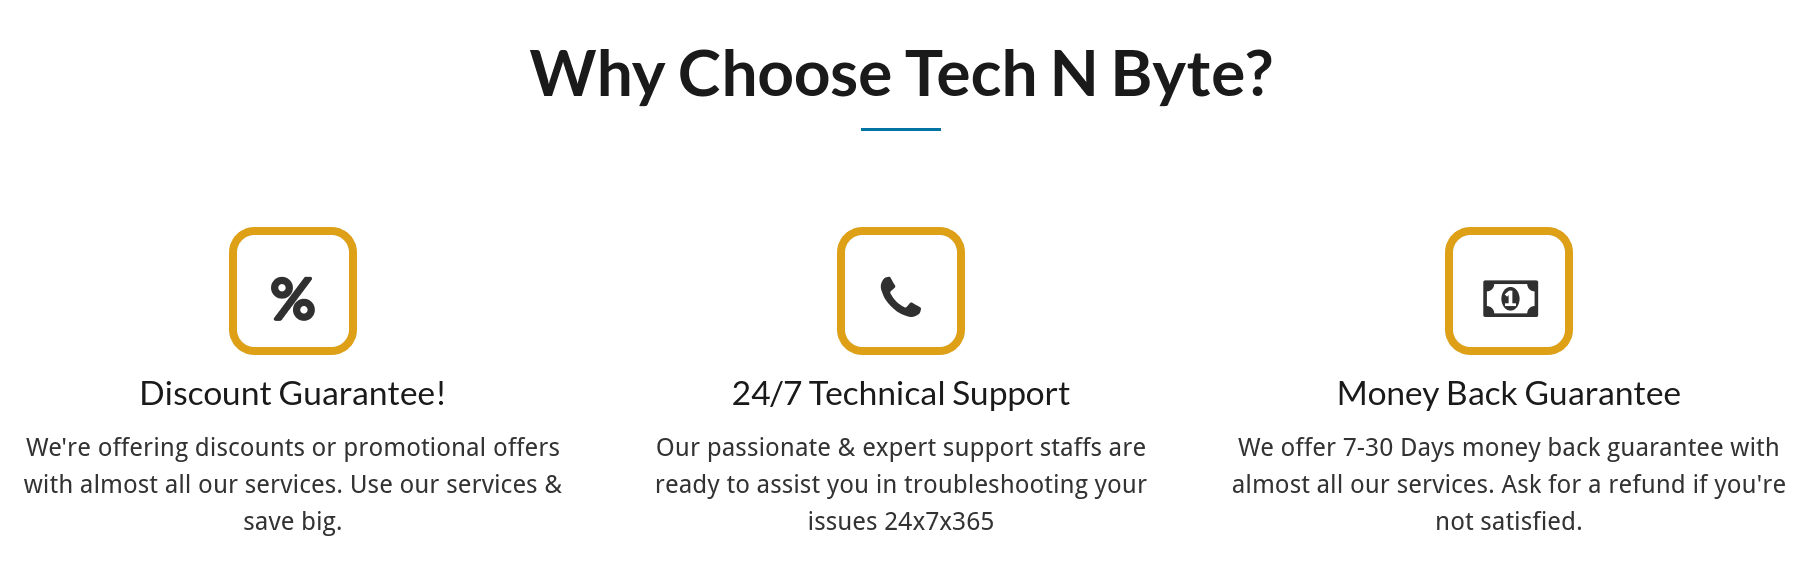 Tech N Byte